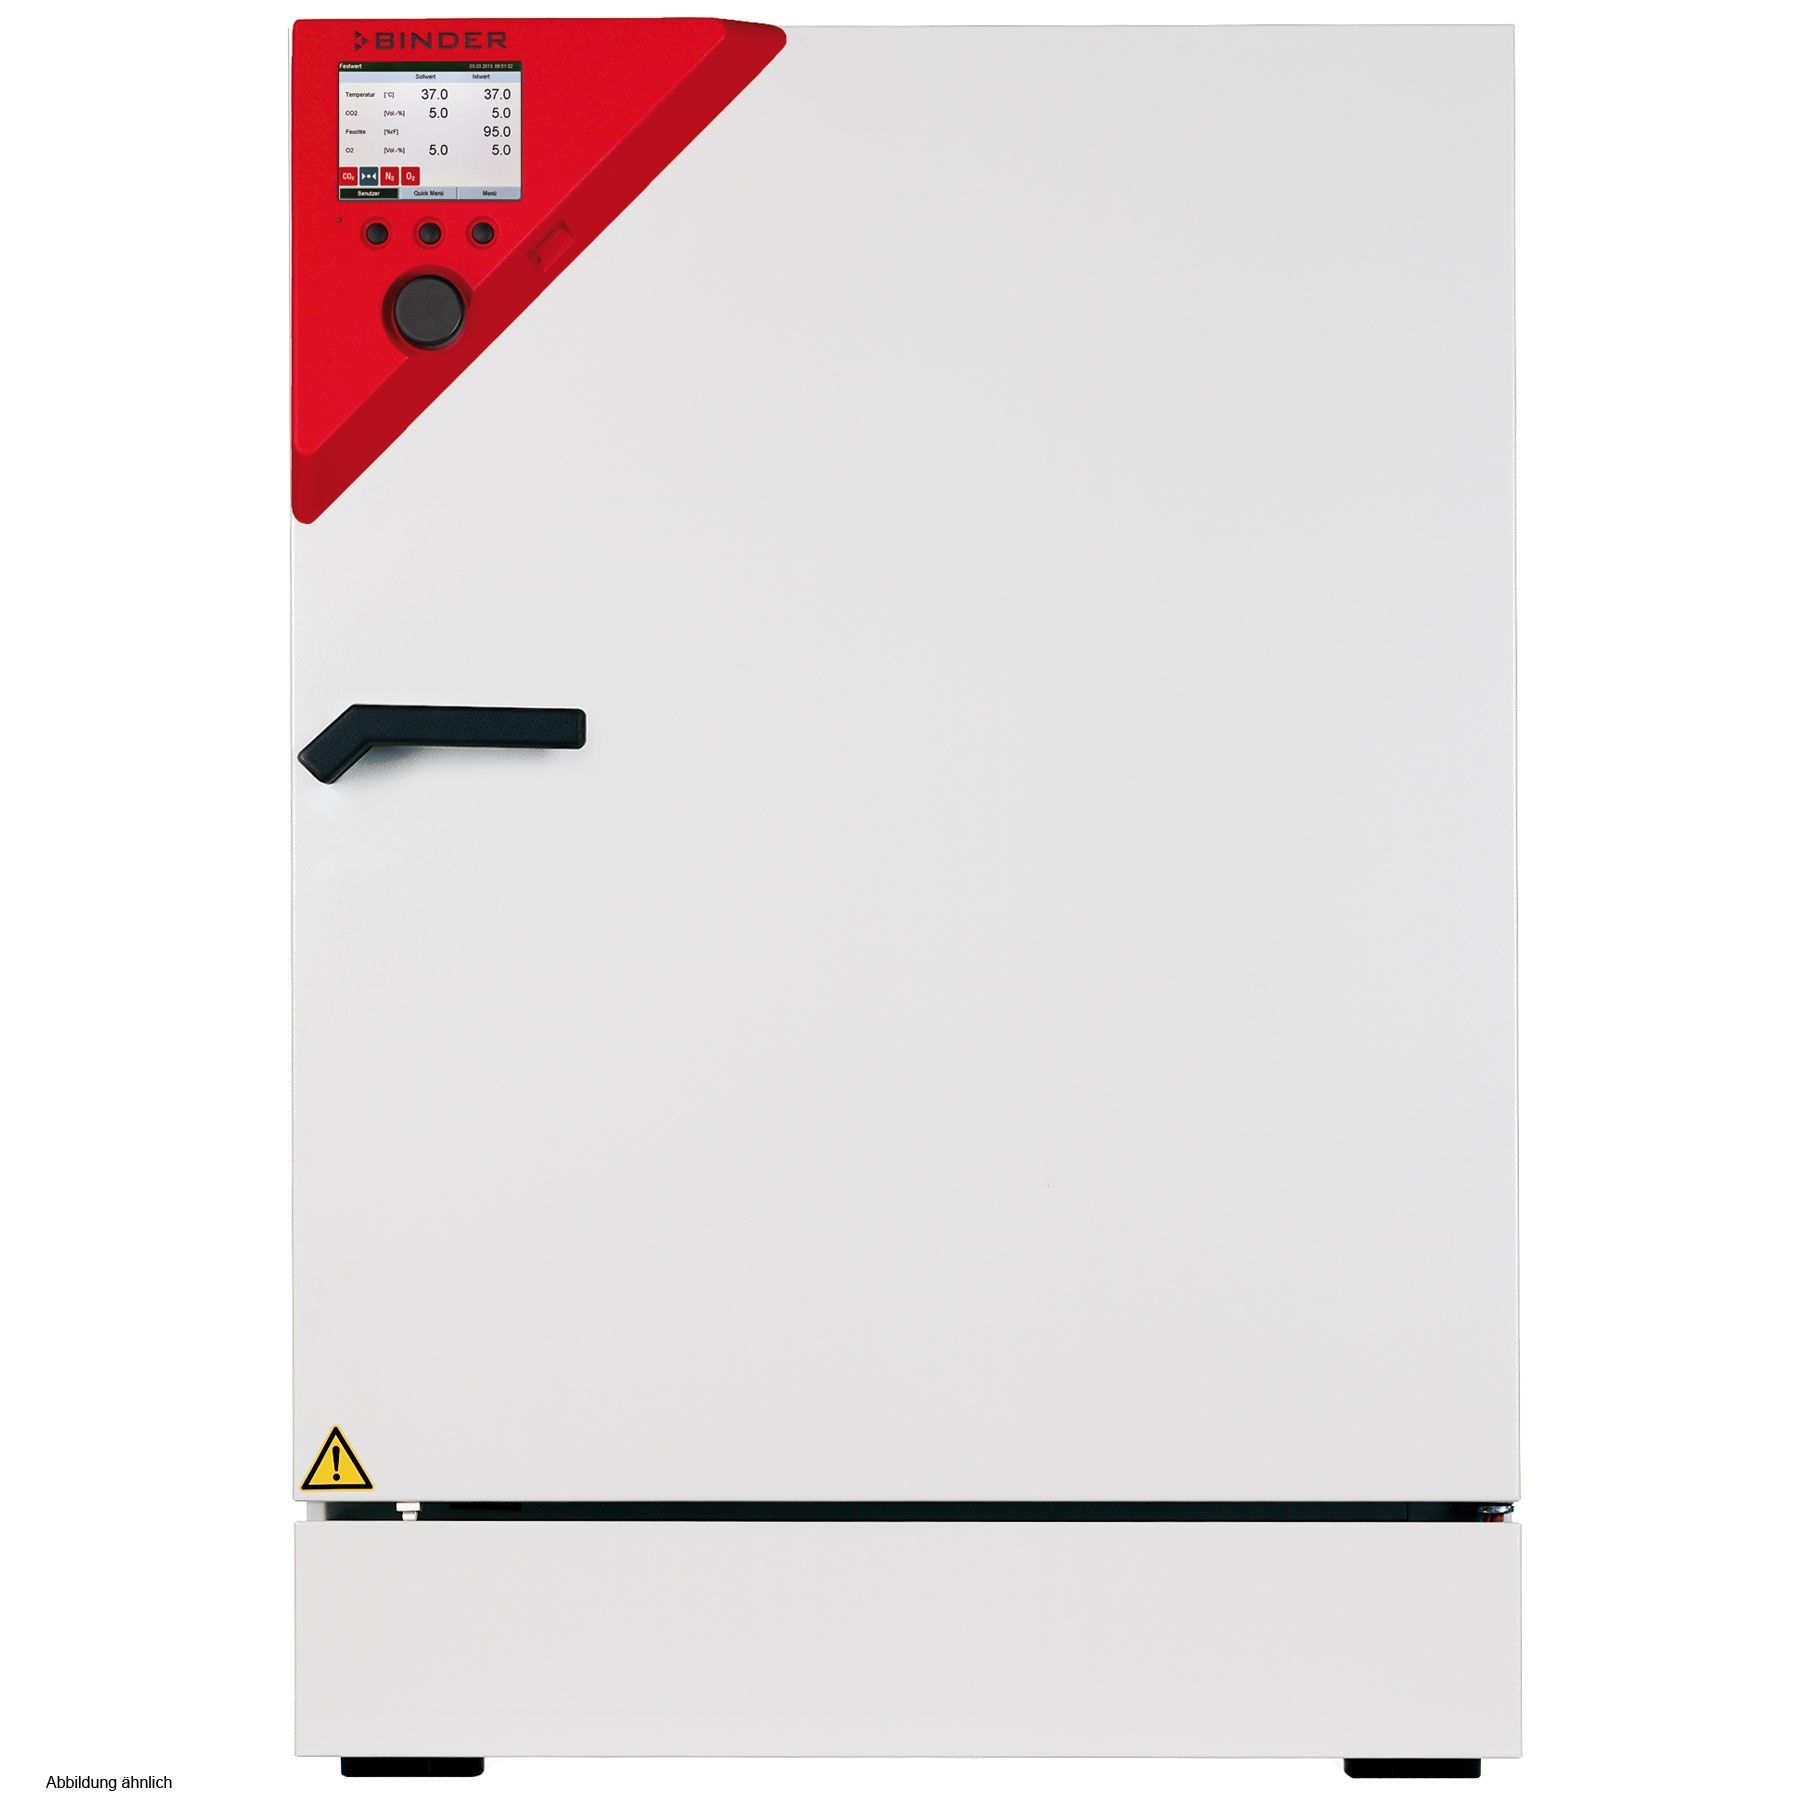 Binder CB220 CO2 Incubator (divided inner door)